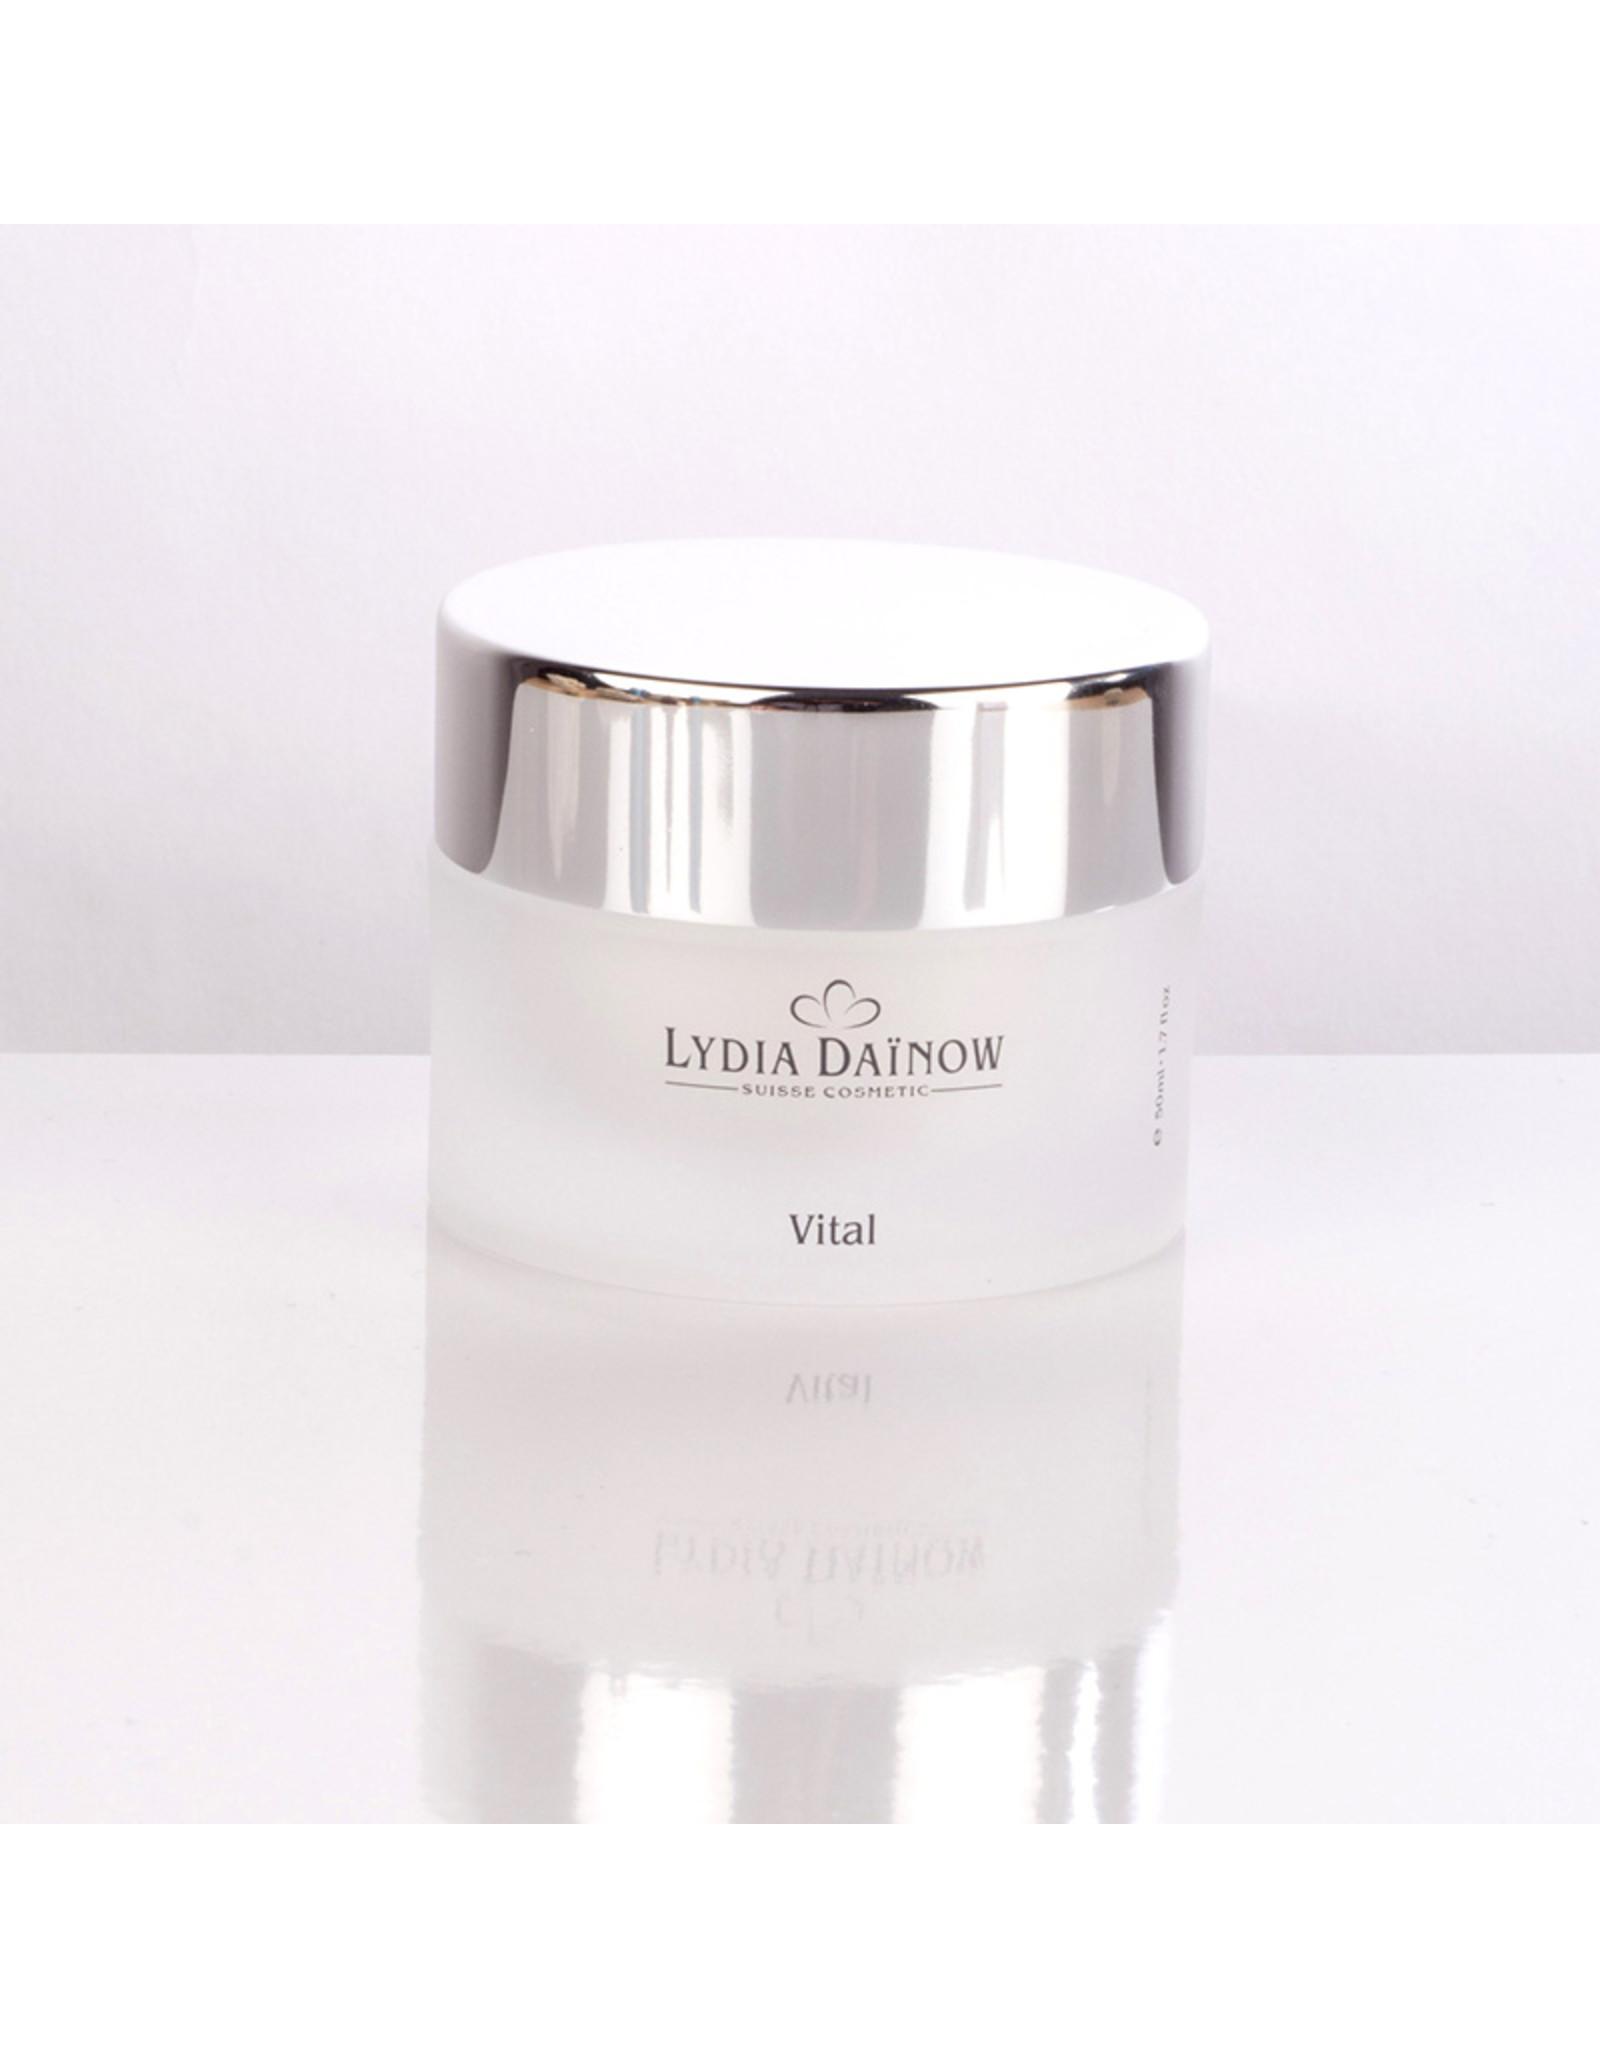 Lydïa Dainow Vital - Crème vitaminée